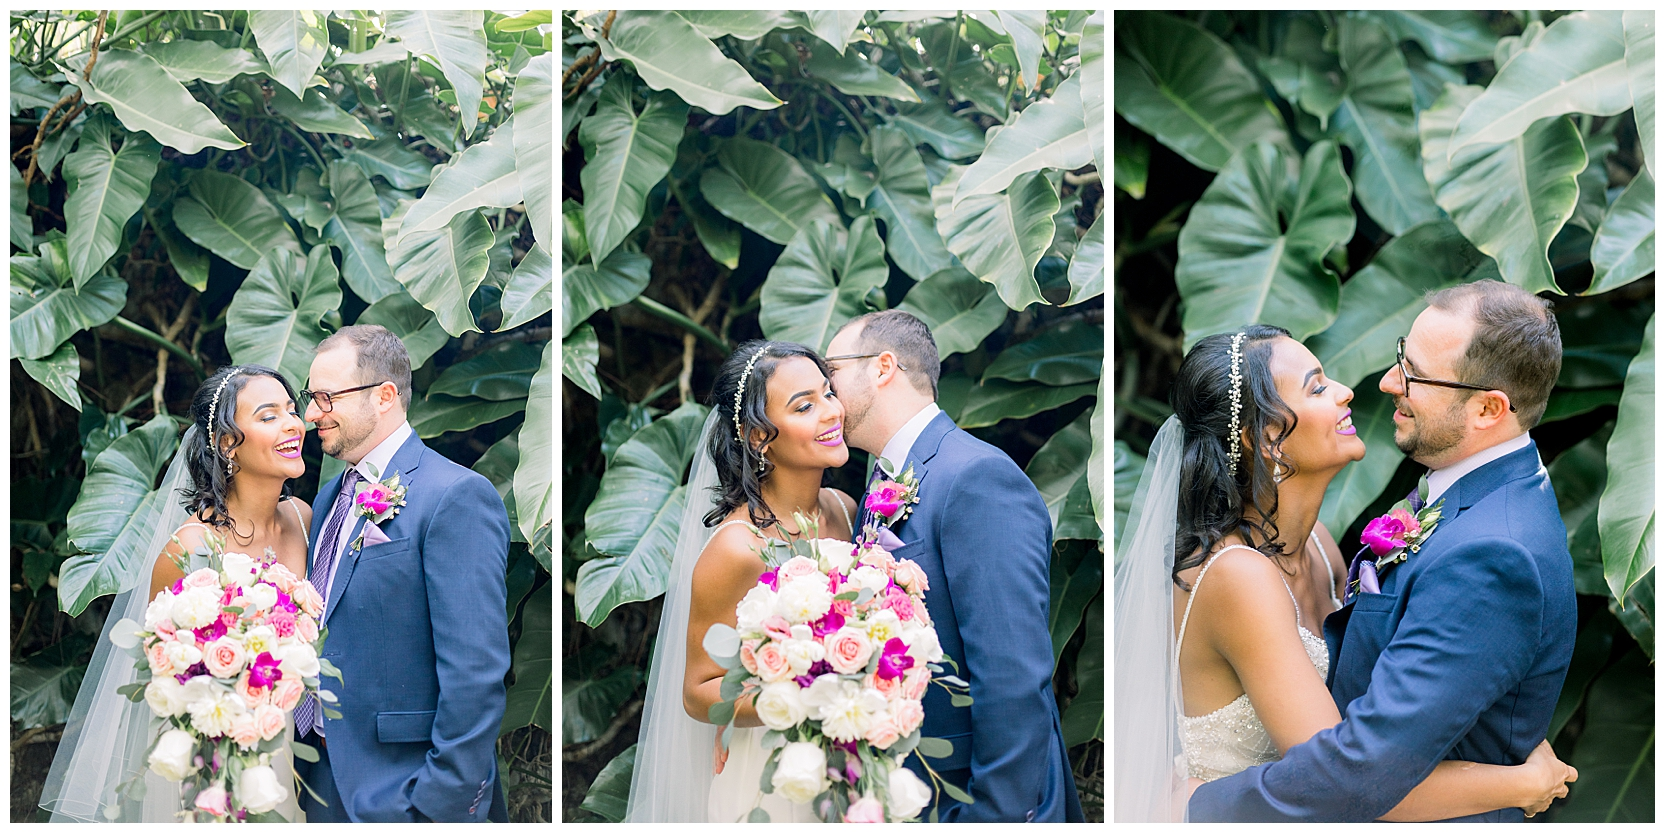 jessicafredericks_lakeland_tampa_wedding_purple_crazy hour_0021.jpg